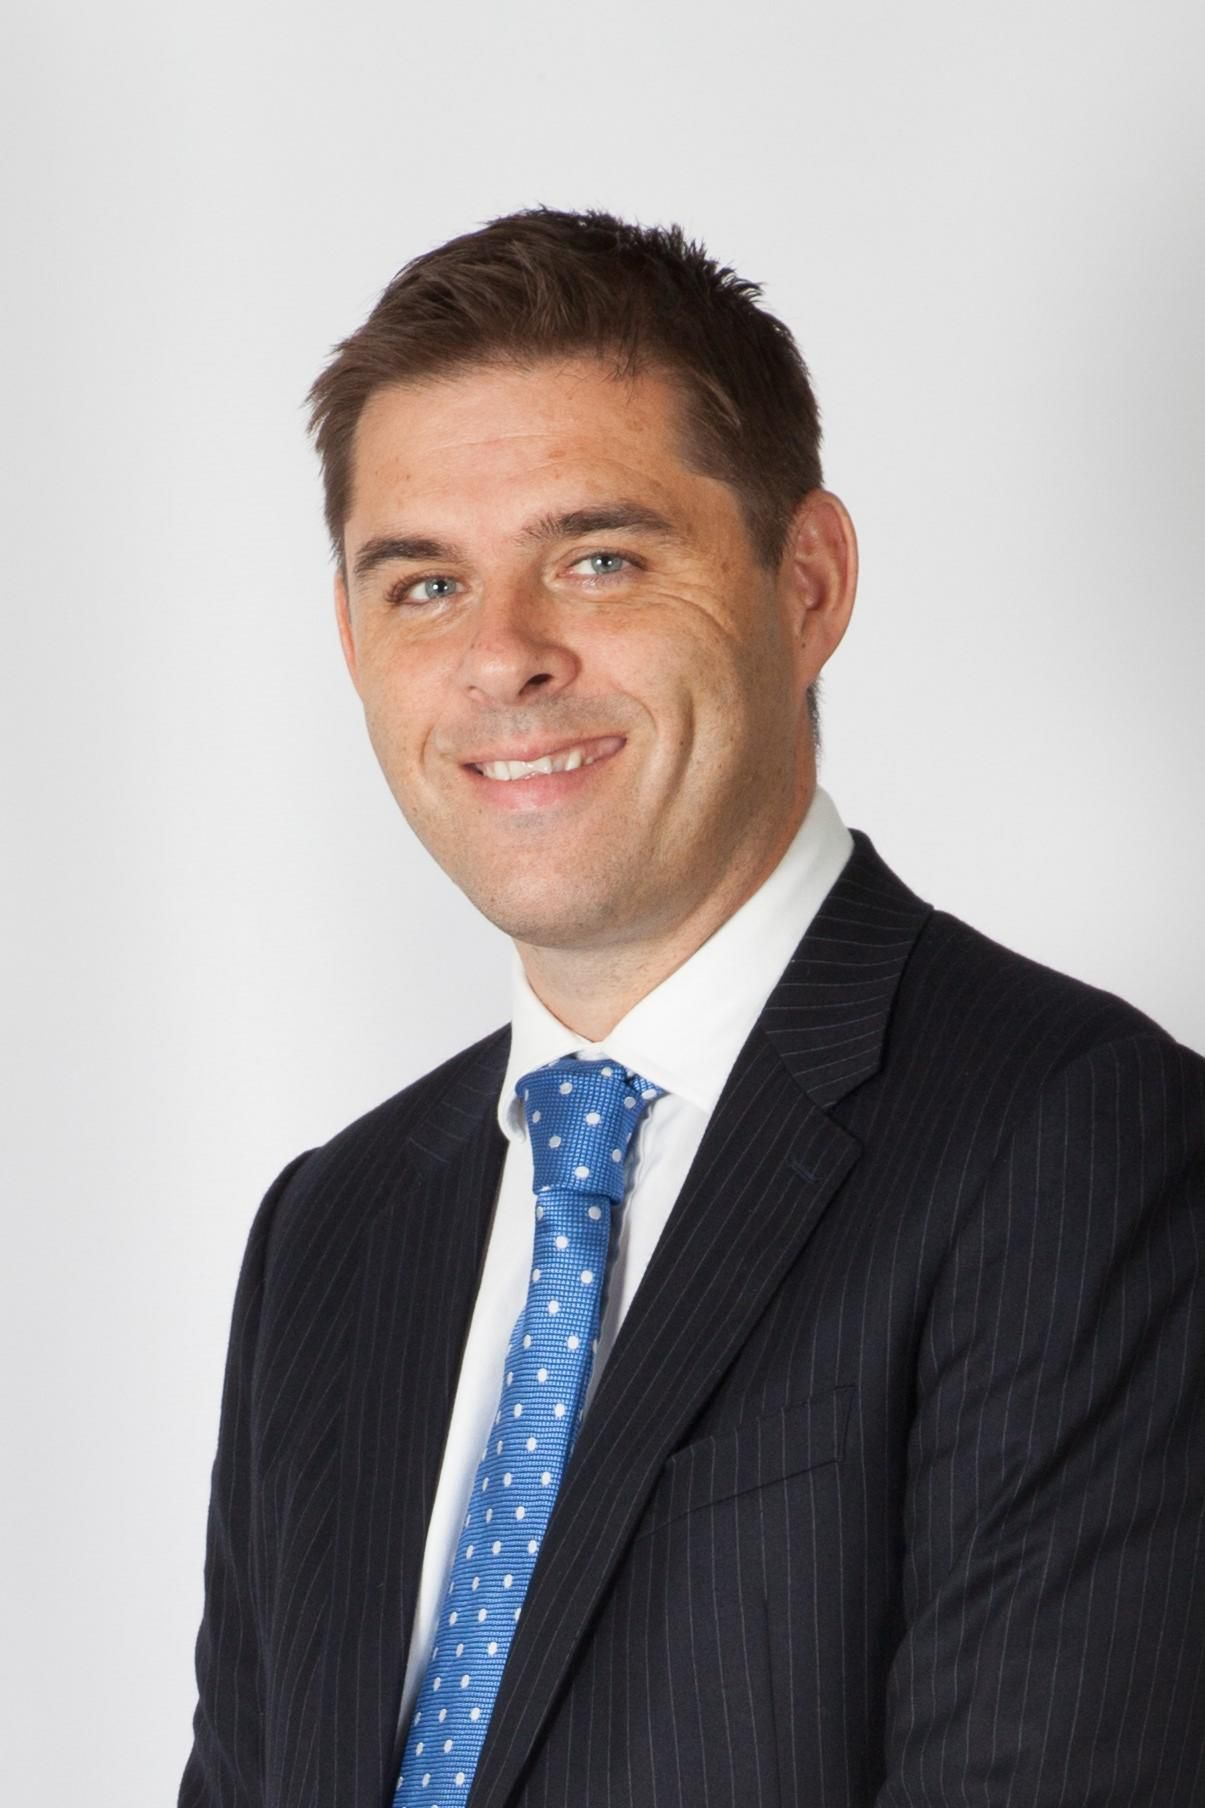 Darren Sinclair